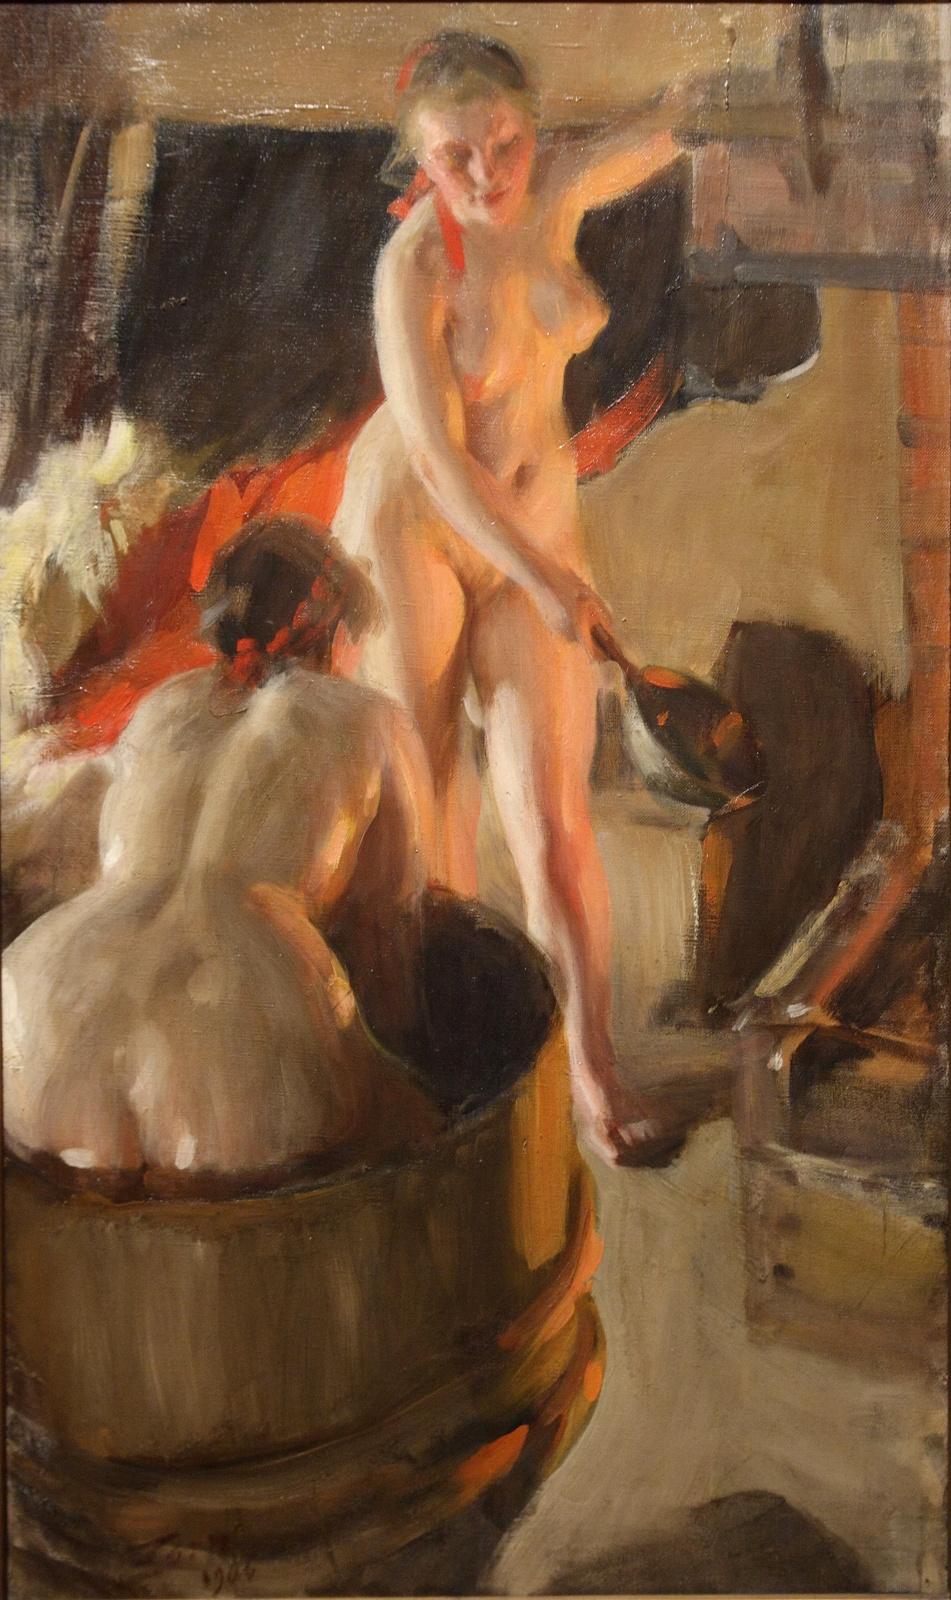 Anders Zorn. Galenika girls in the bath